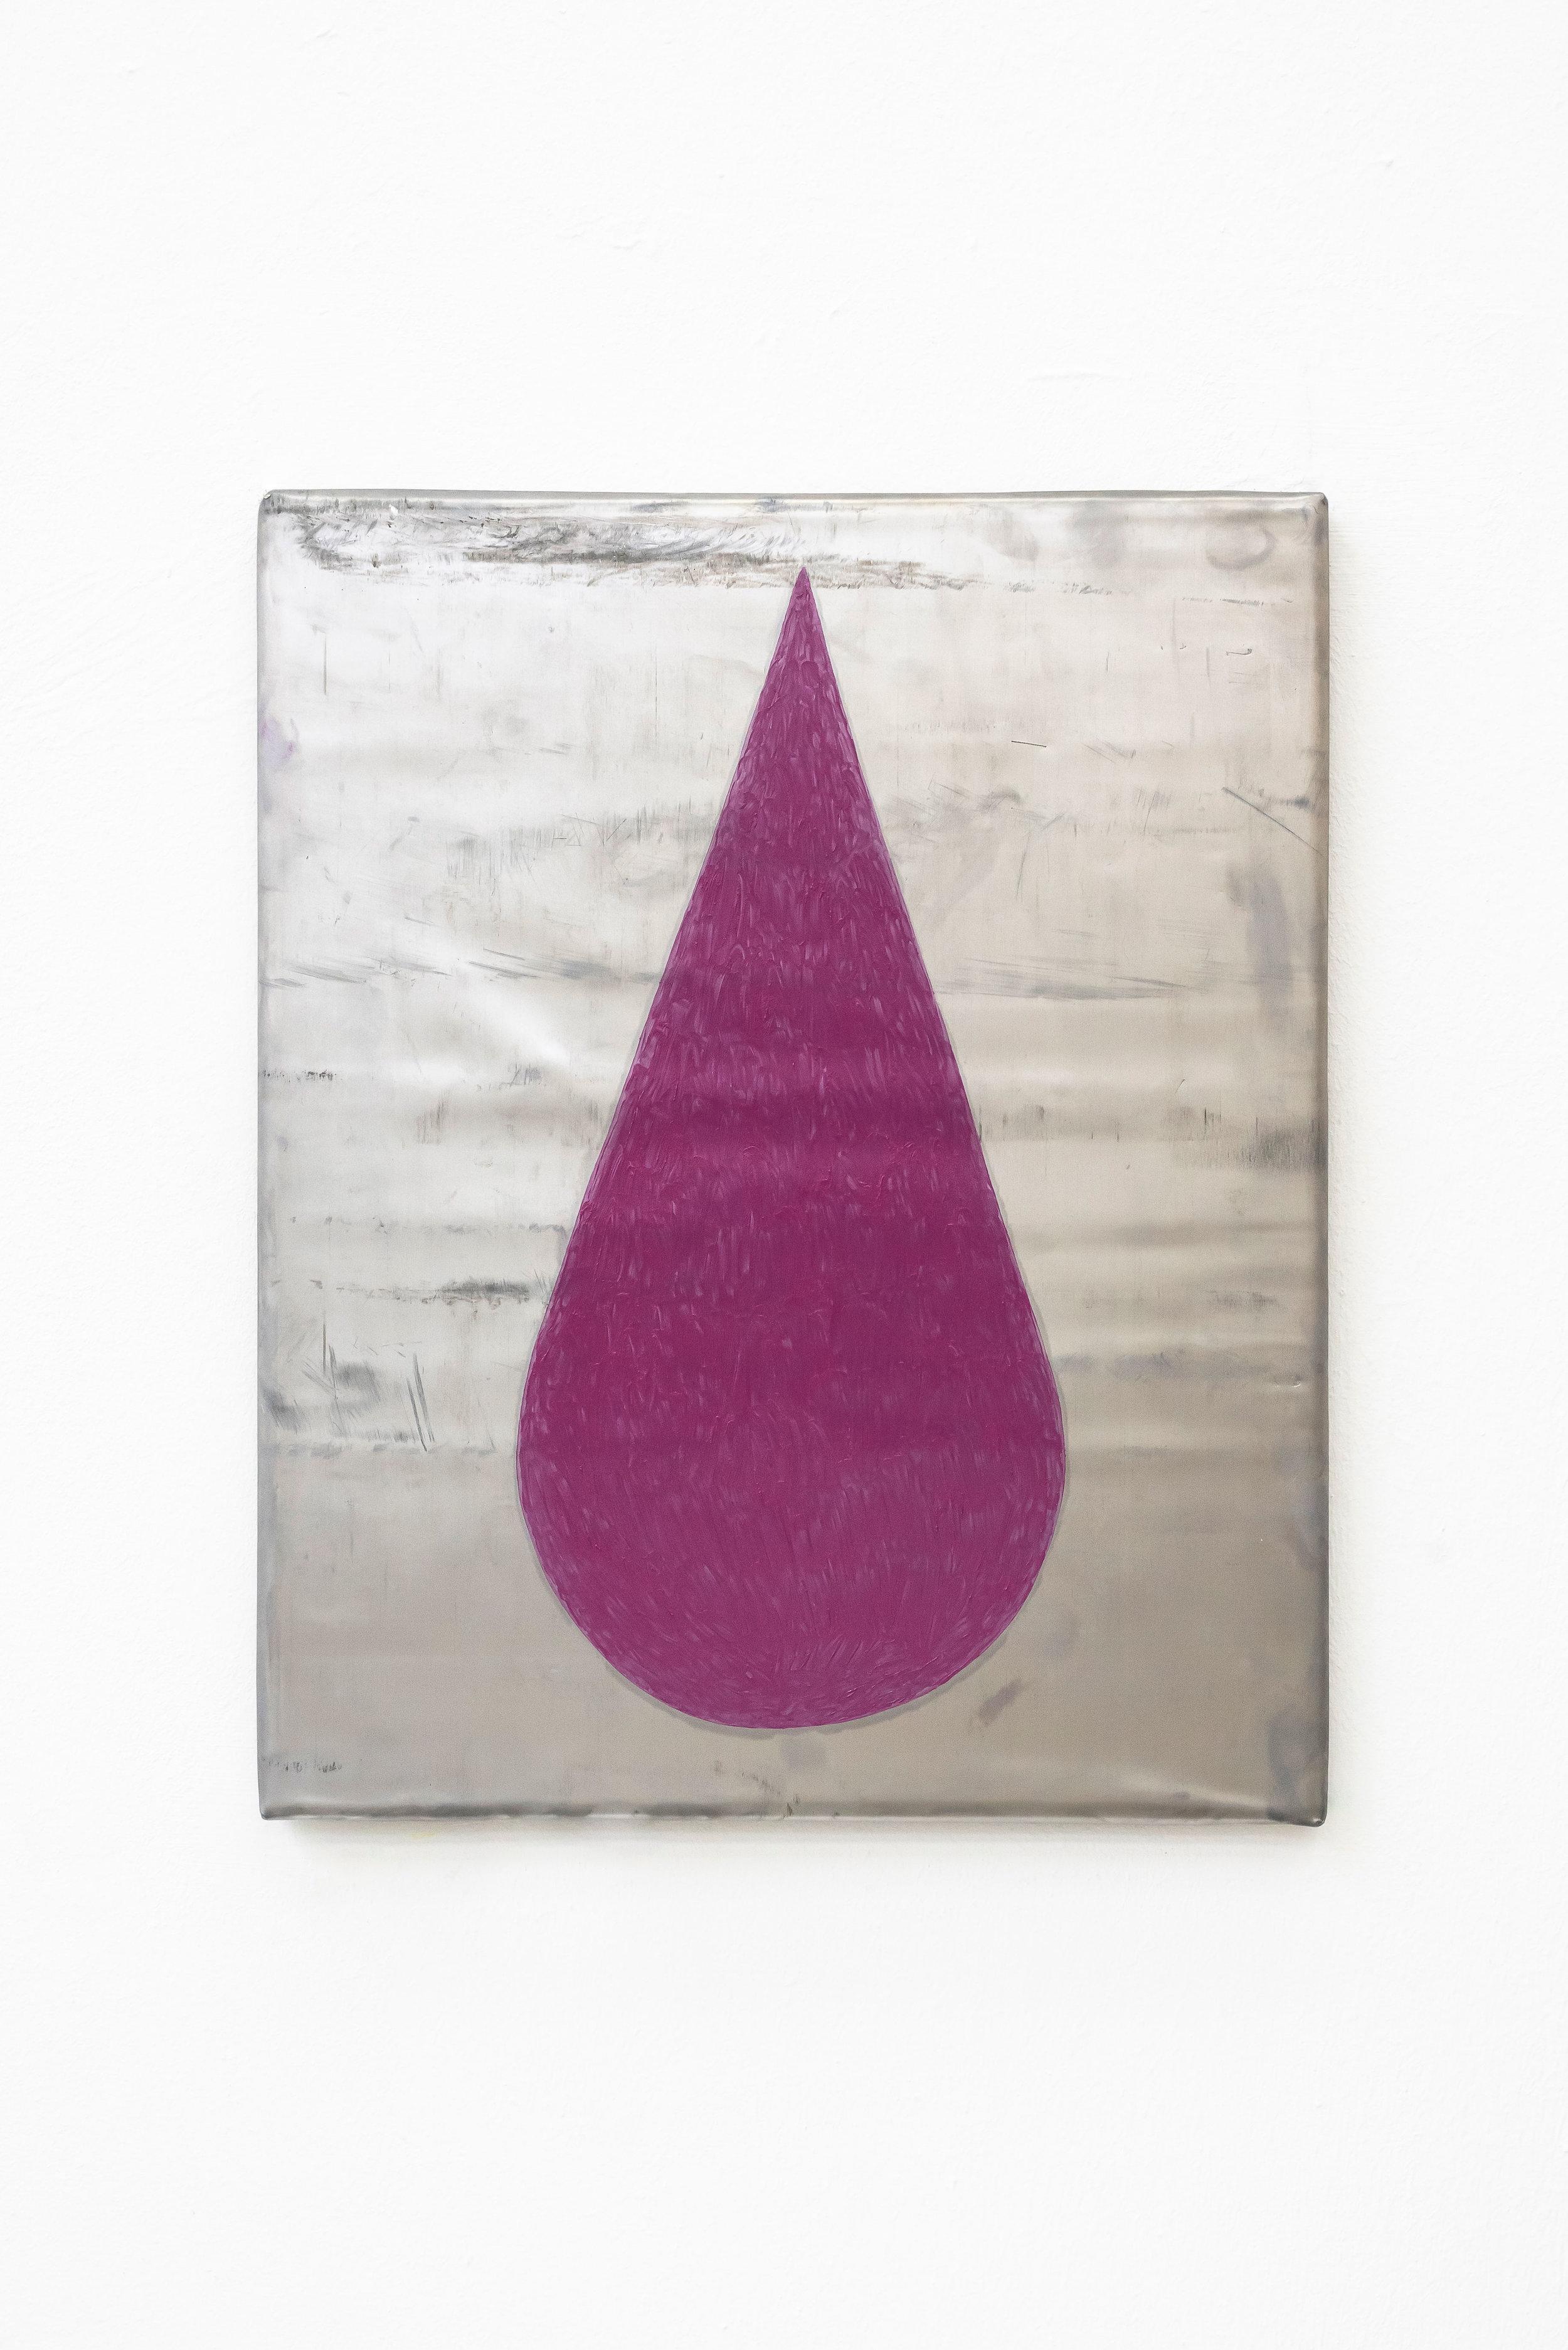 "MICHAEL SAILSTORFER. ""HEAVY TEAR 27 CHANEL 454 JEAN"" (2018). LEAD, LIPSTICK. 19 5/8 × 15 3/4 × 3/4 INCHES. COURTESY THE ARTIST."